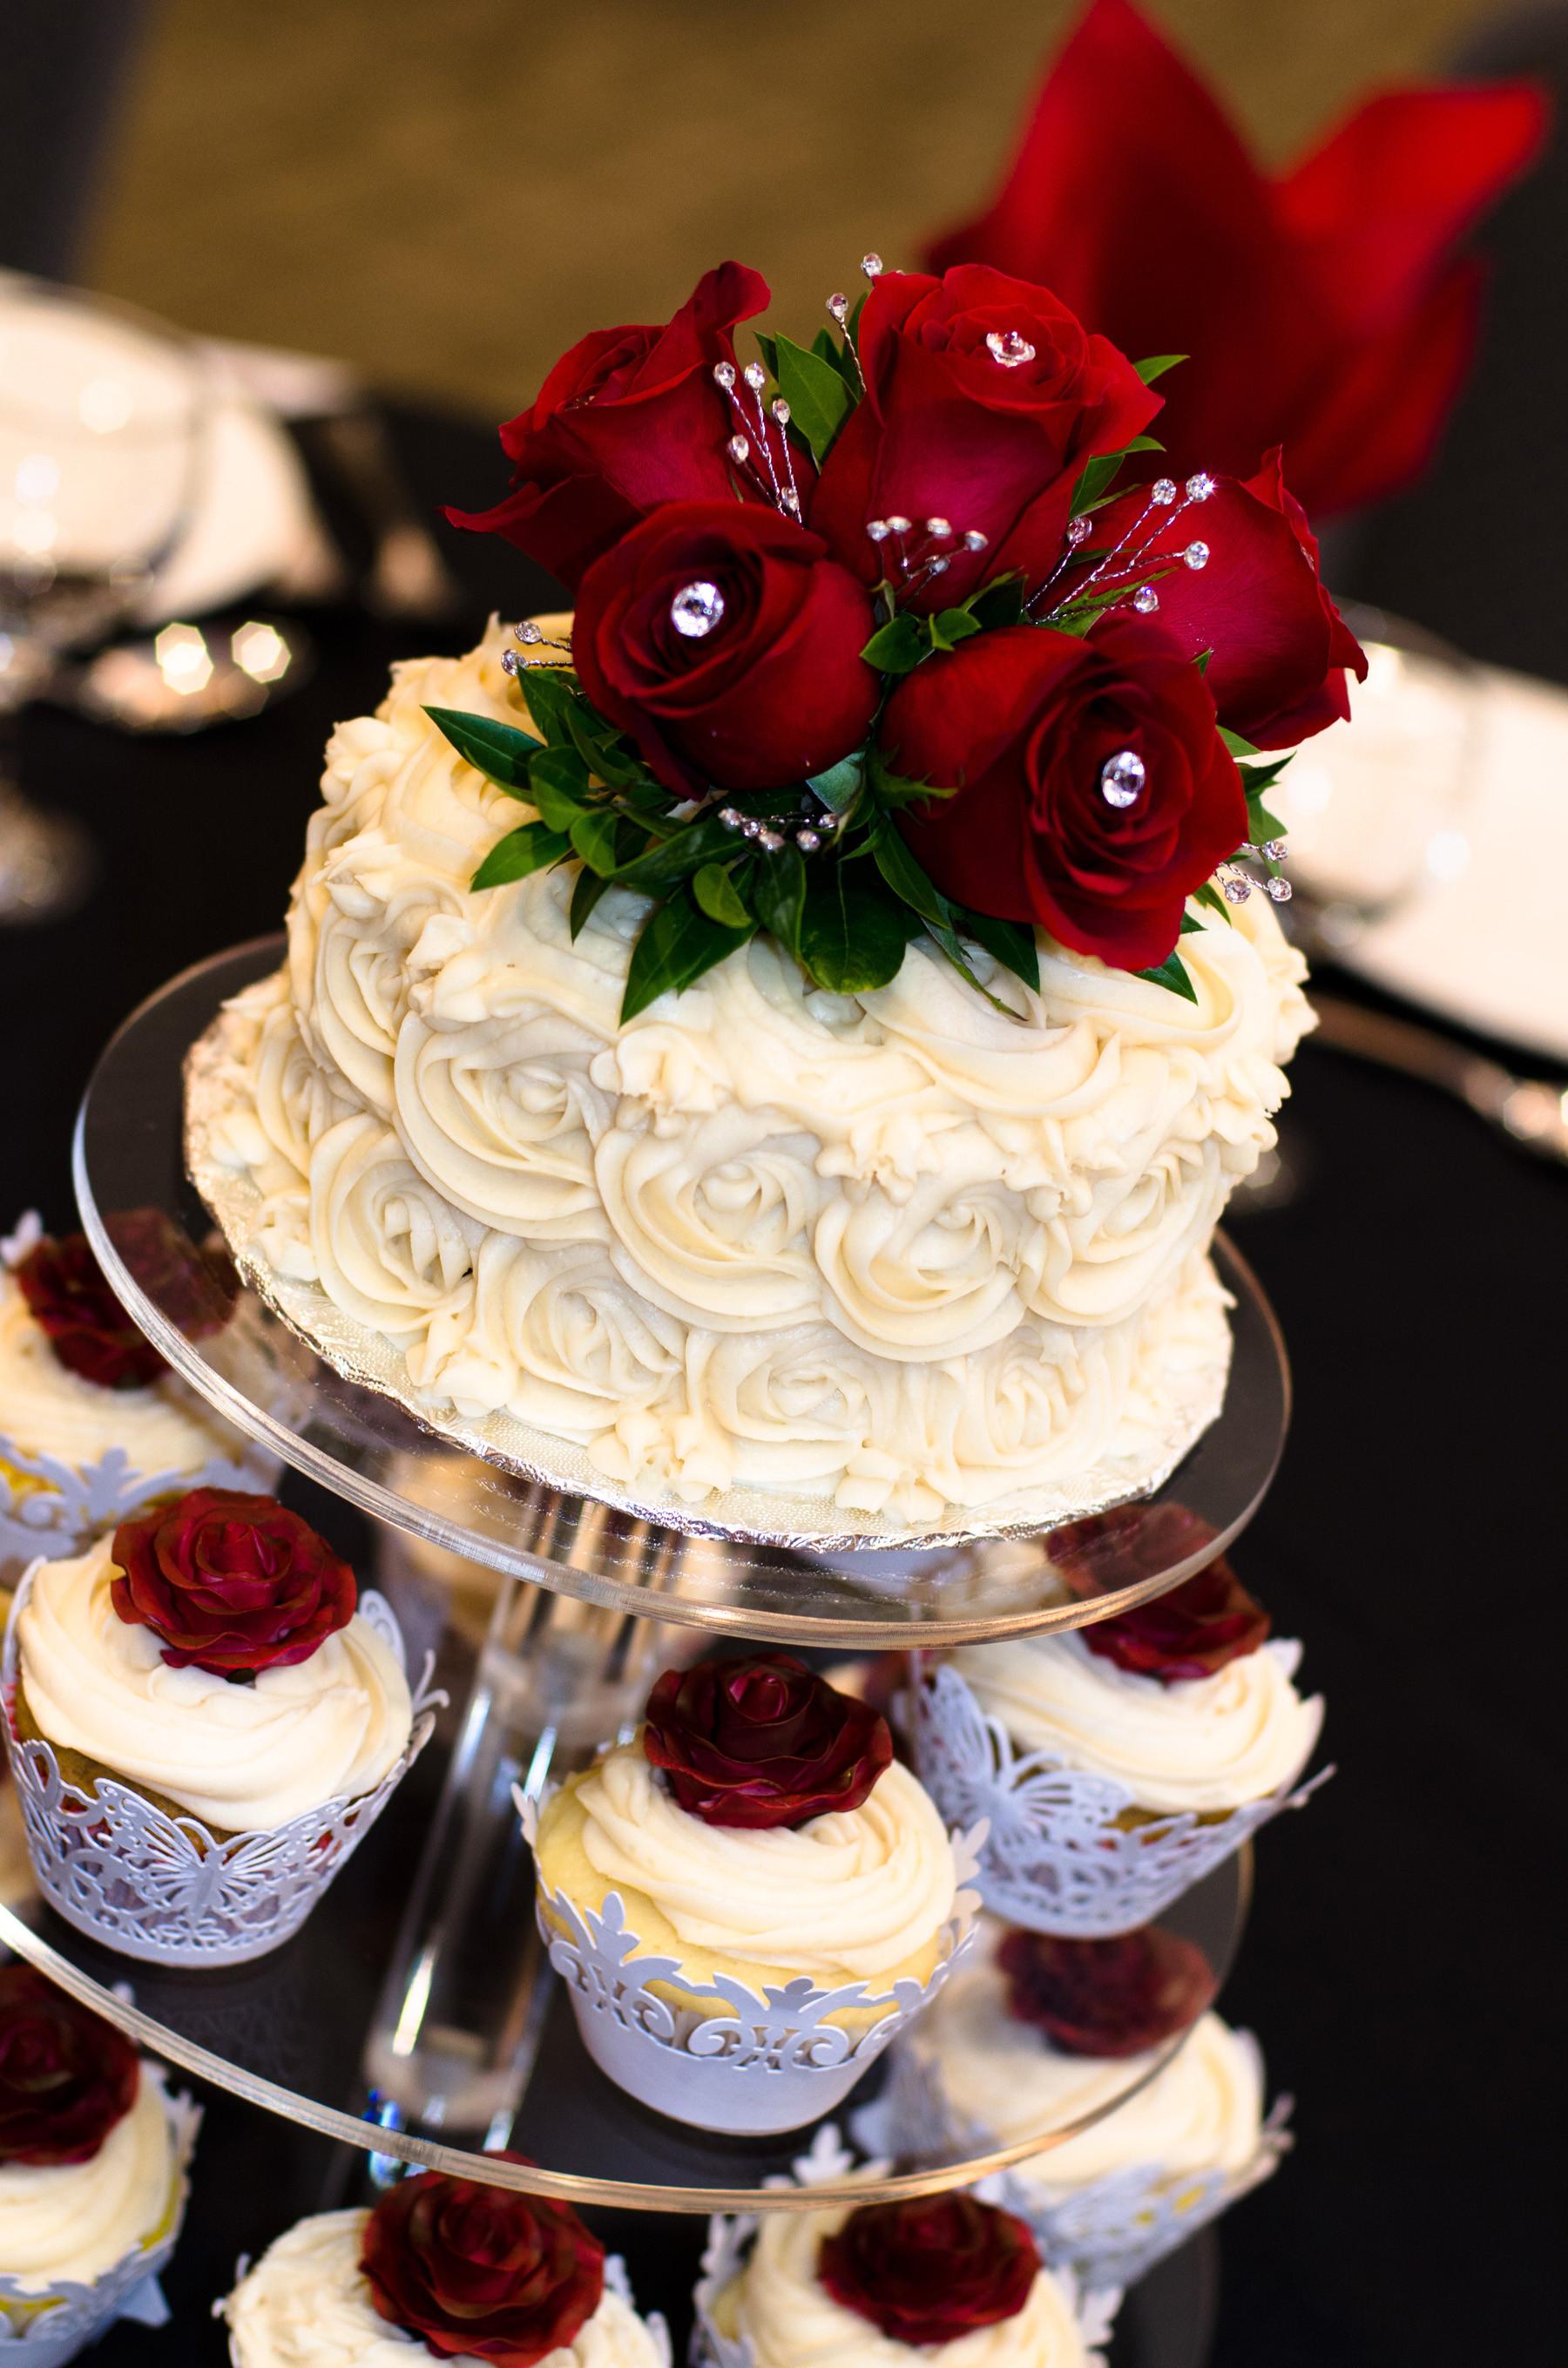 Designer Wedding Cakes  Tips for Choosing a Wedding Cake Design